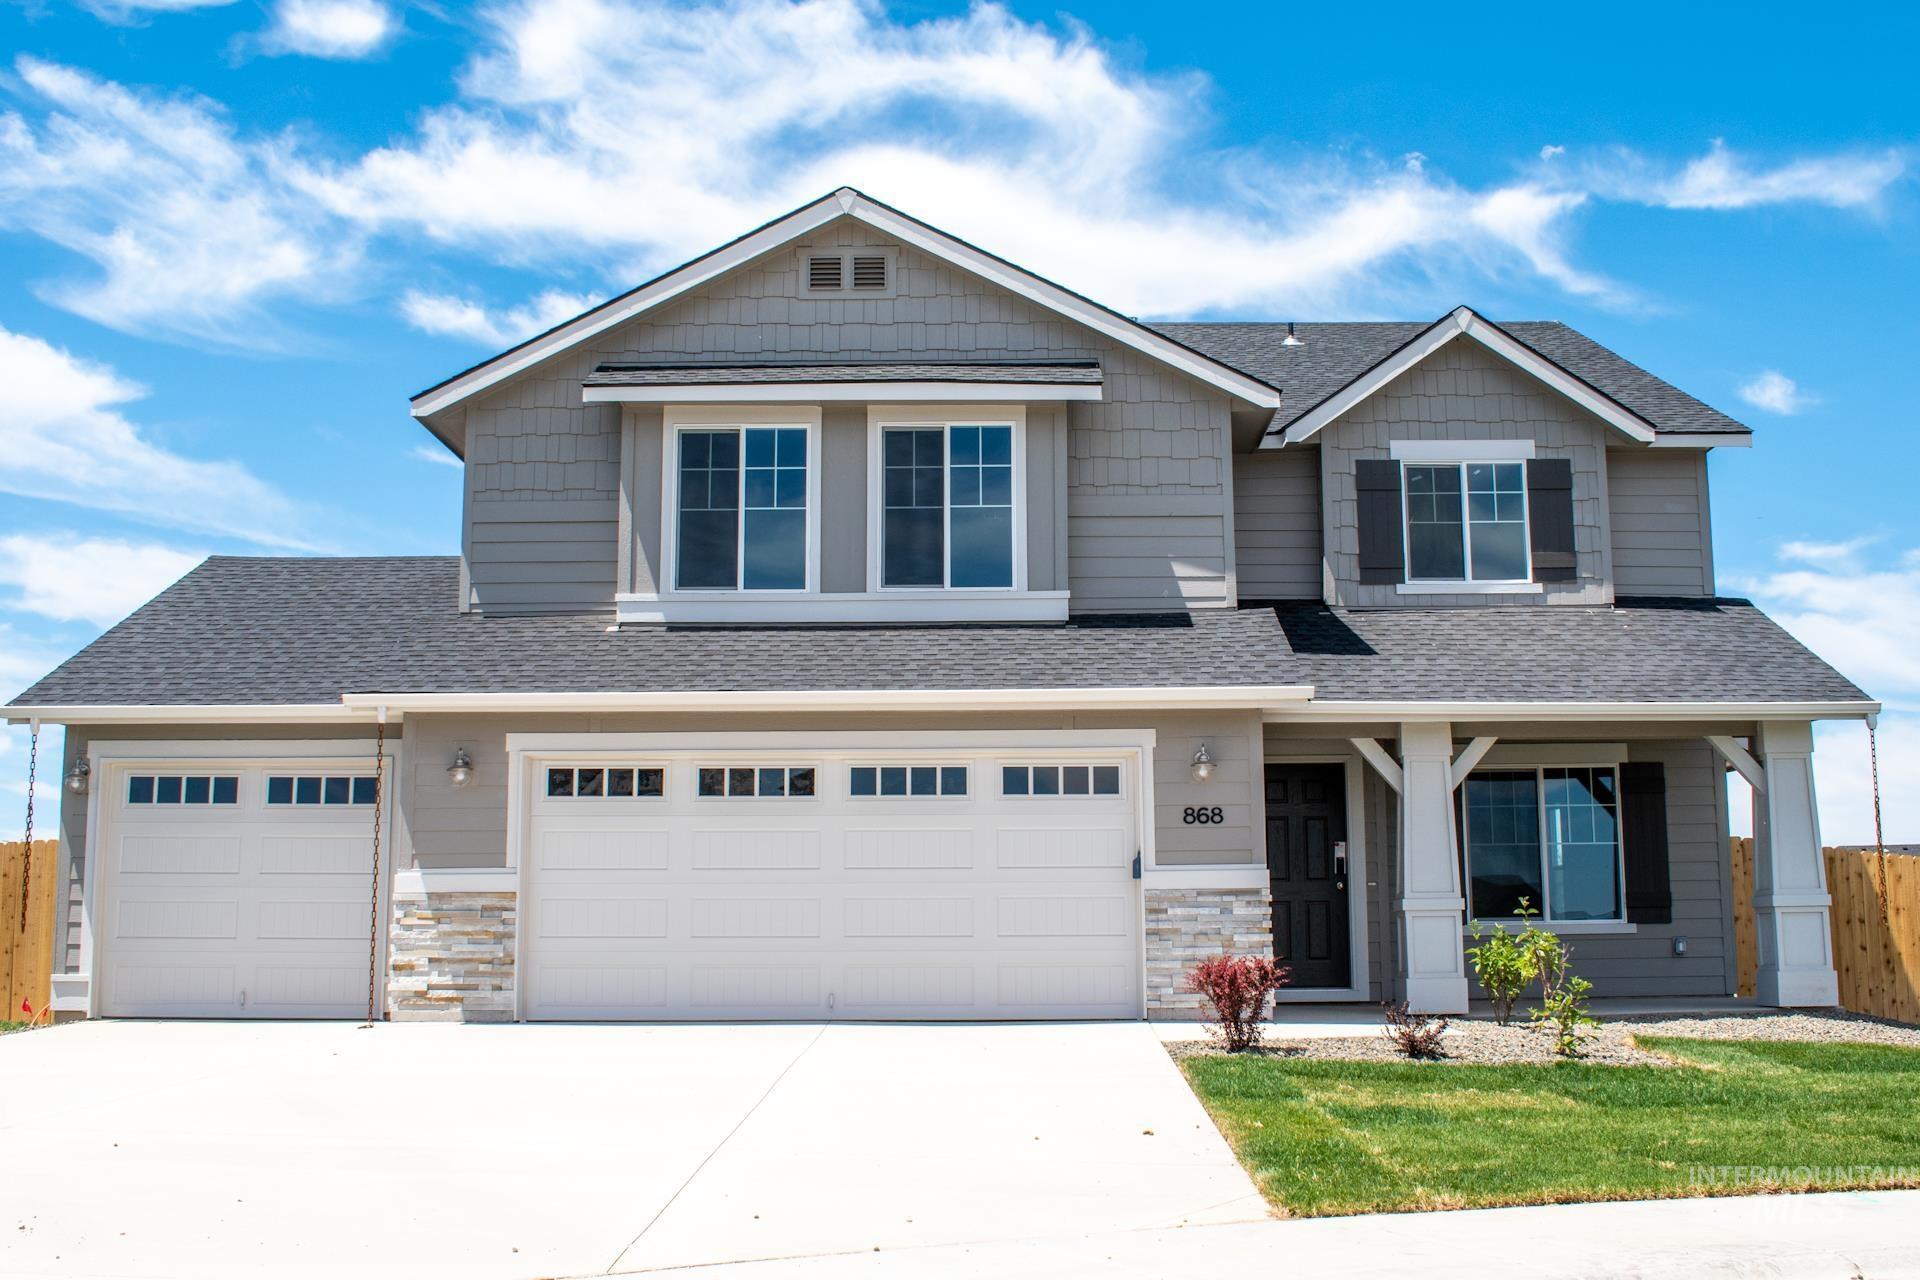 868 W Buttonbush Ct Property Photo 1